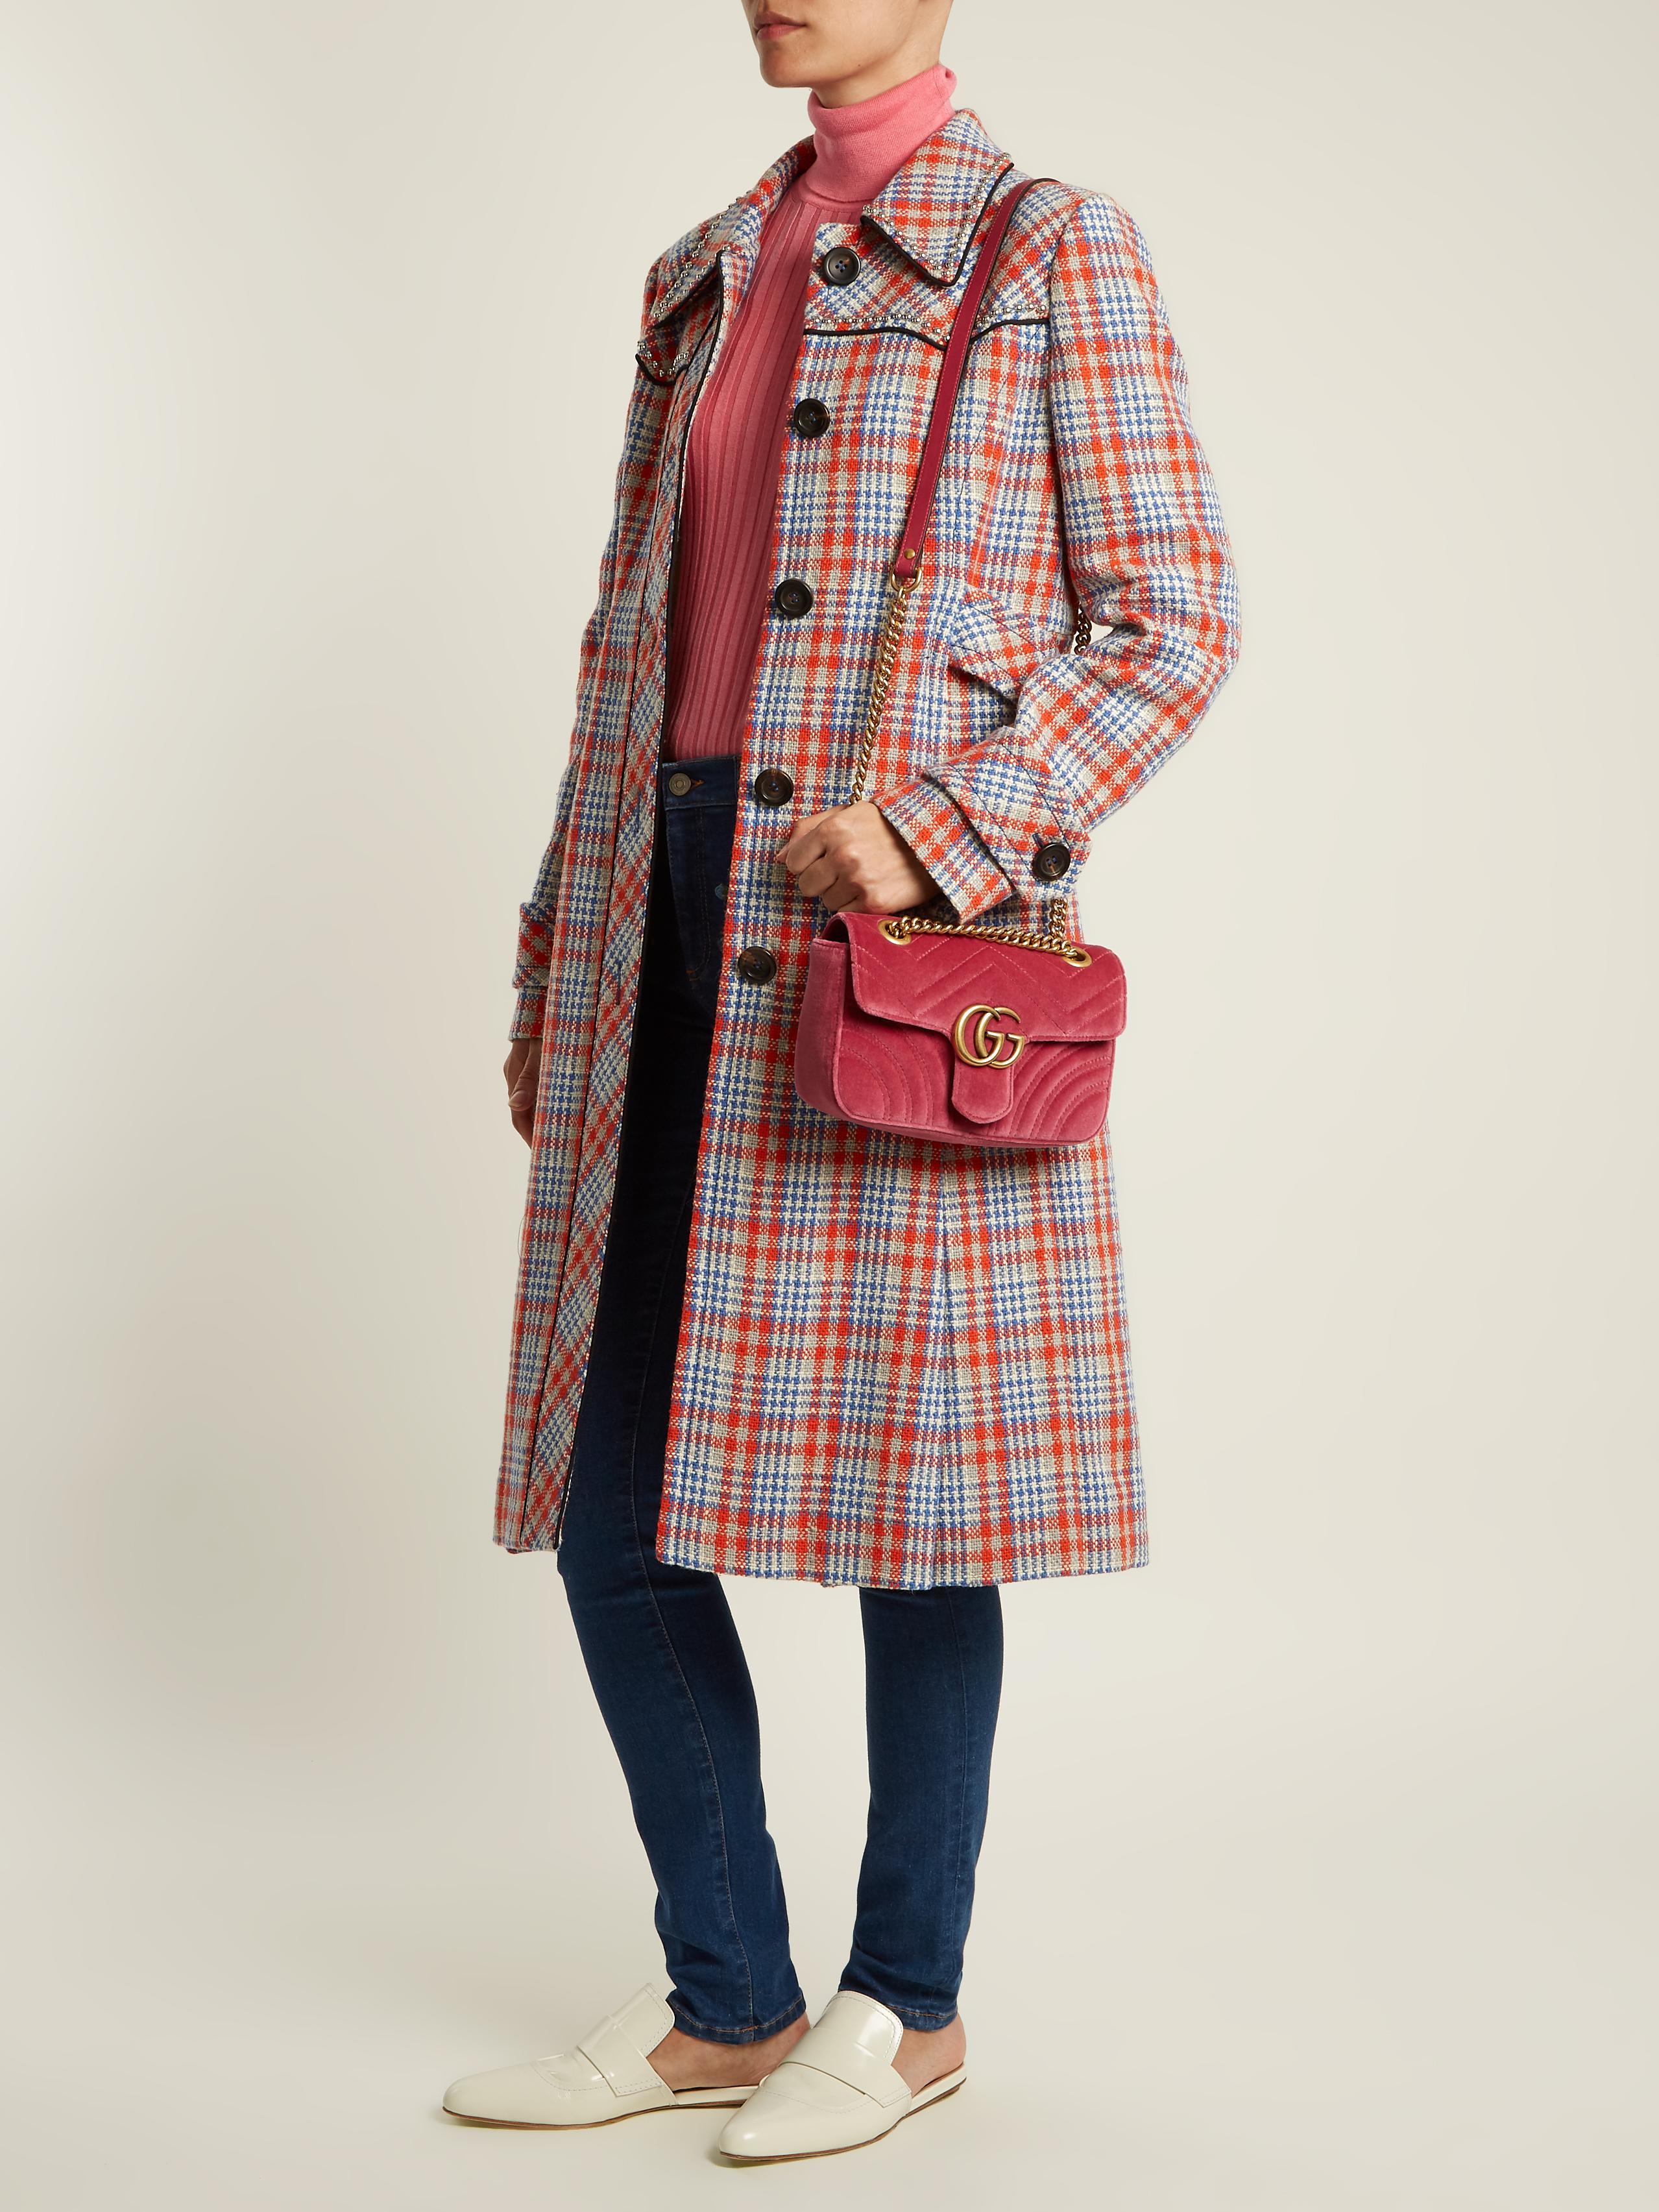 Gg Marmont Mini Quilted Velvet Shoulder Bag - Pink Gucci N98rm